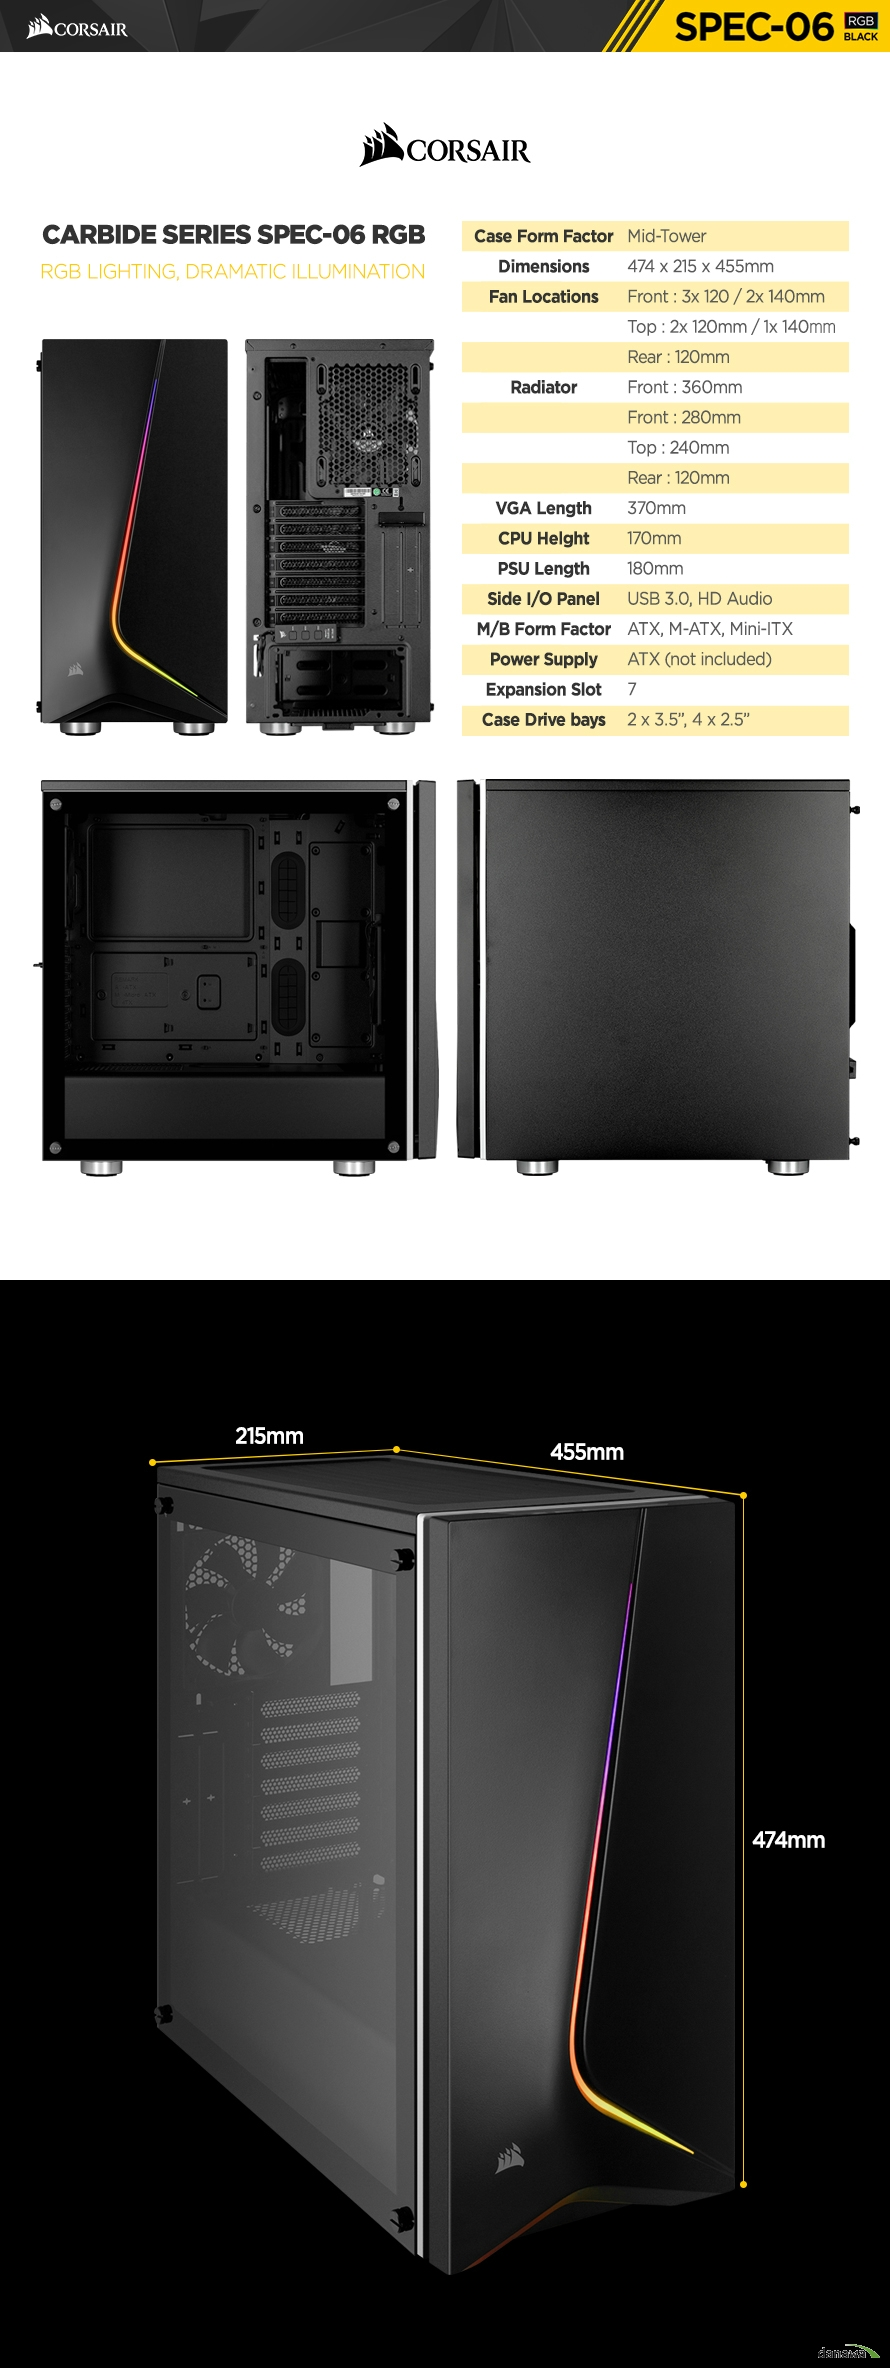 CORSAIR CARBIDE SERIES SPEC-06 RGB(BLACK)